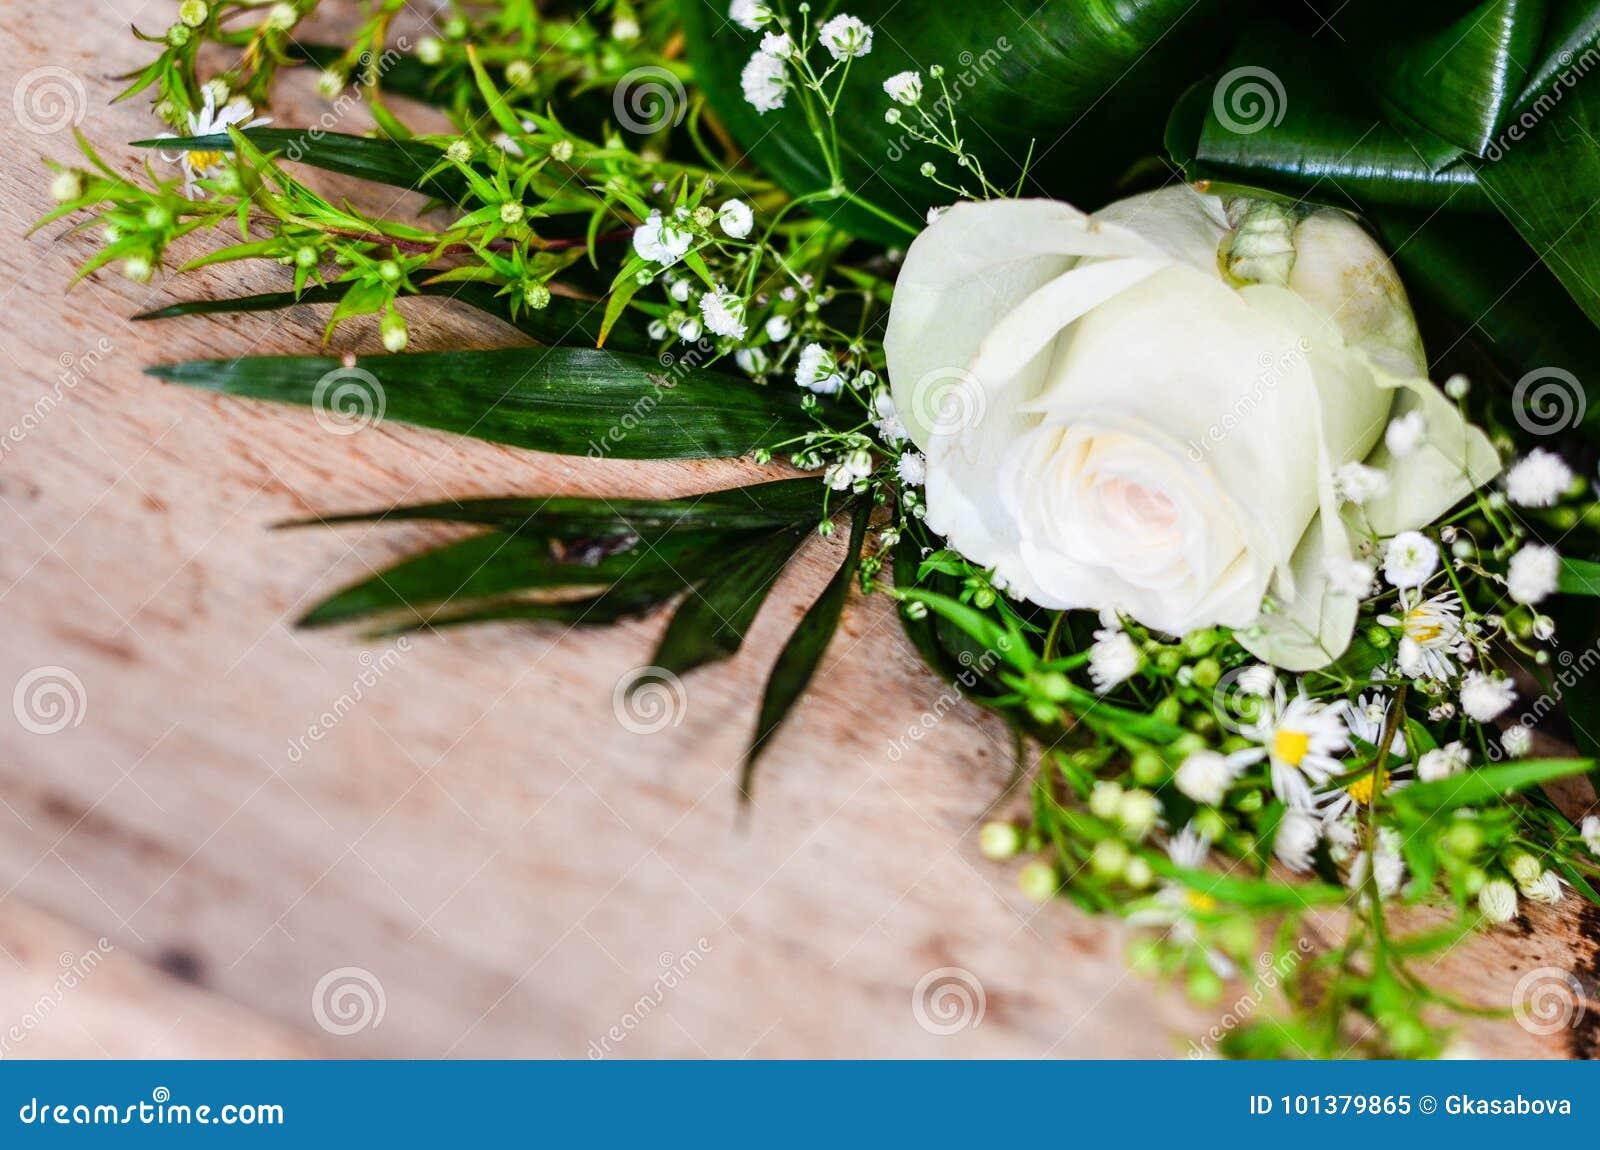 Roses stock image image of flower birthday close 101379865 photo taken on october 03rd izmirmasajfo